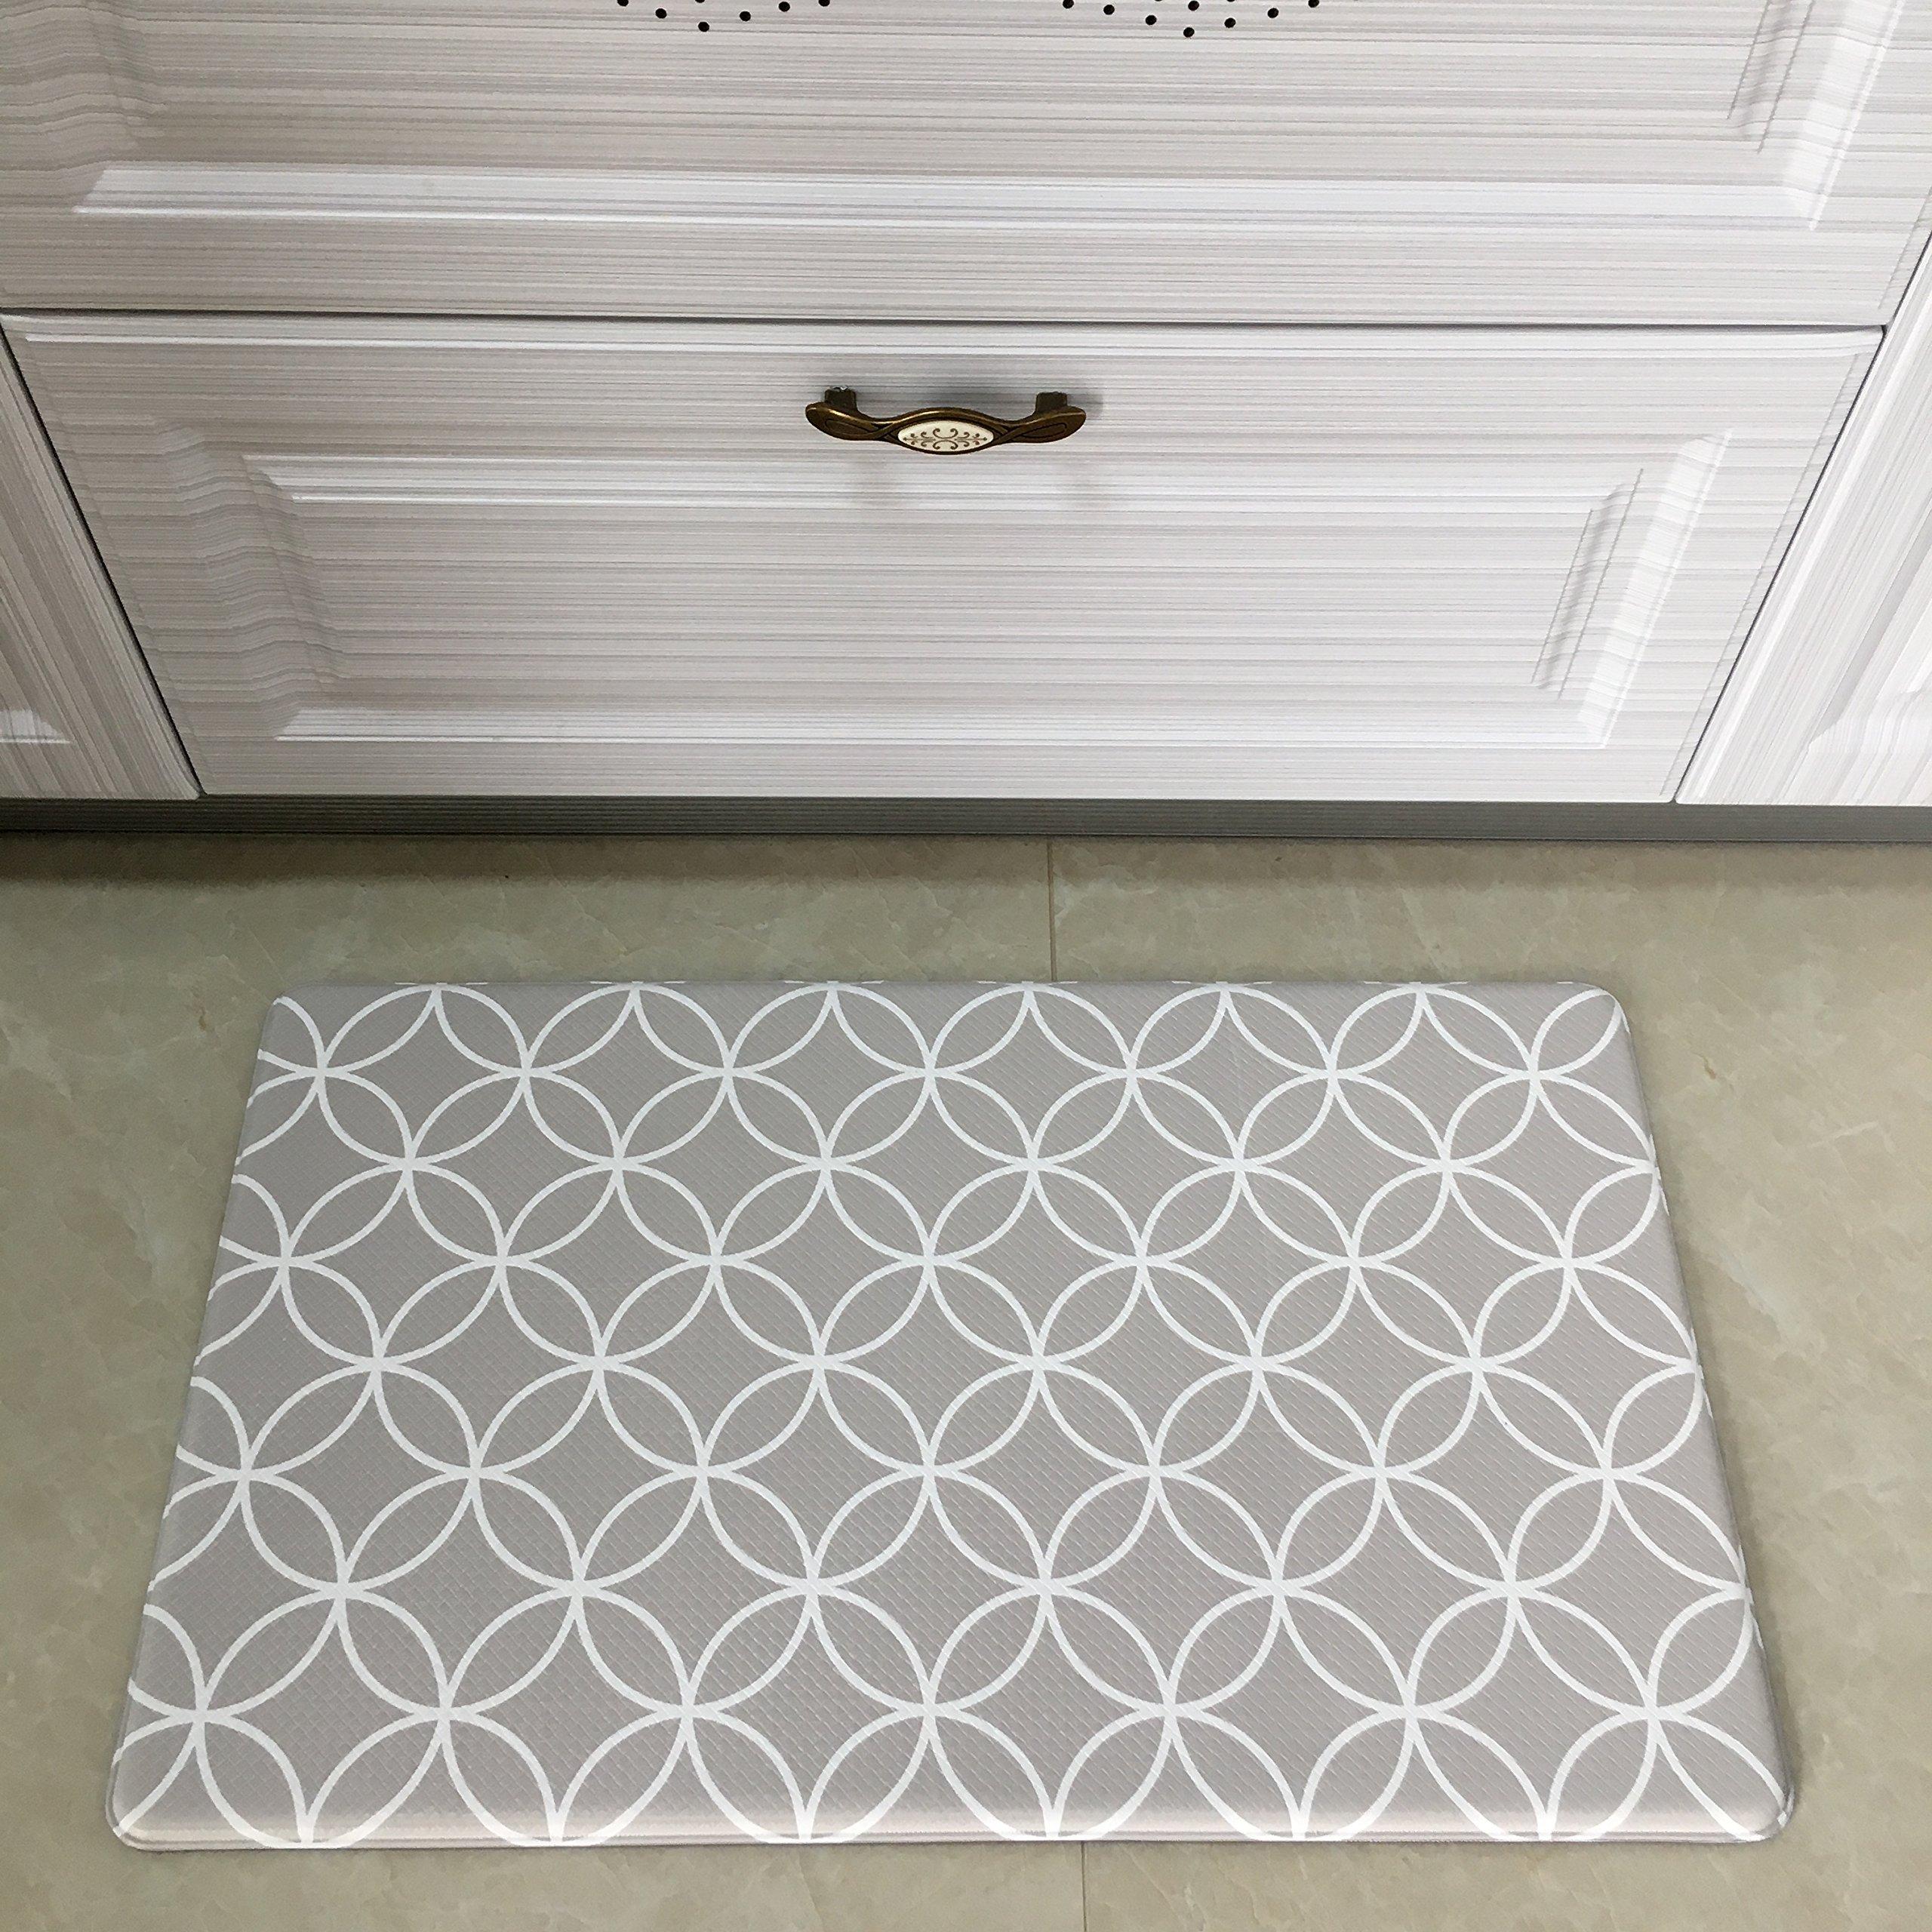 Art3d Premium Kitchen/Office Comfort Standing Mat Comfort Kitchen Rug, 18'' W X 30'' L by Art3d (Image #4)